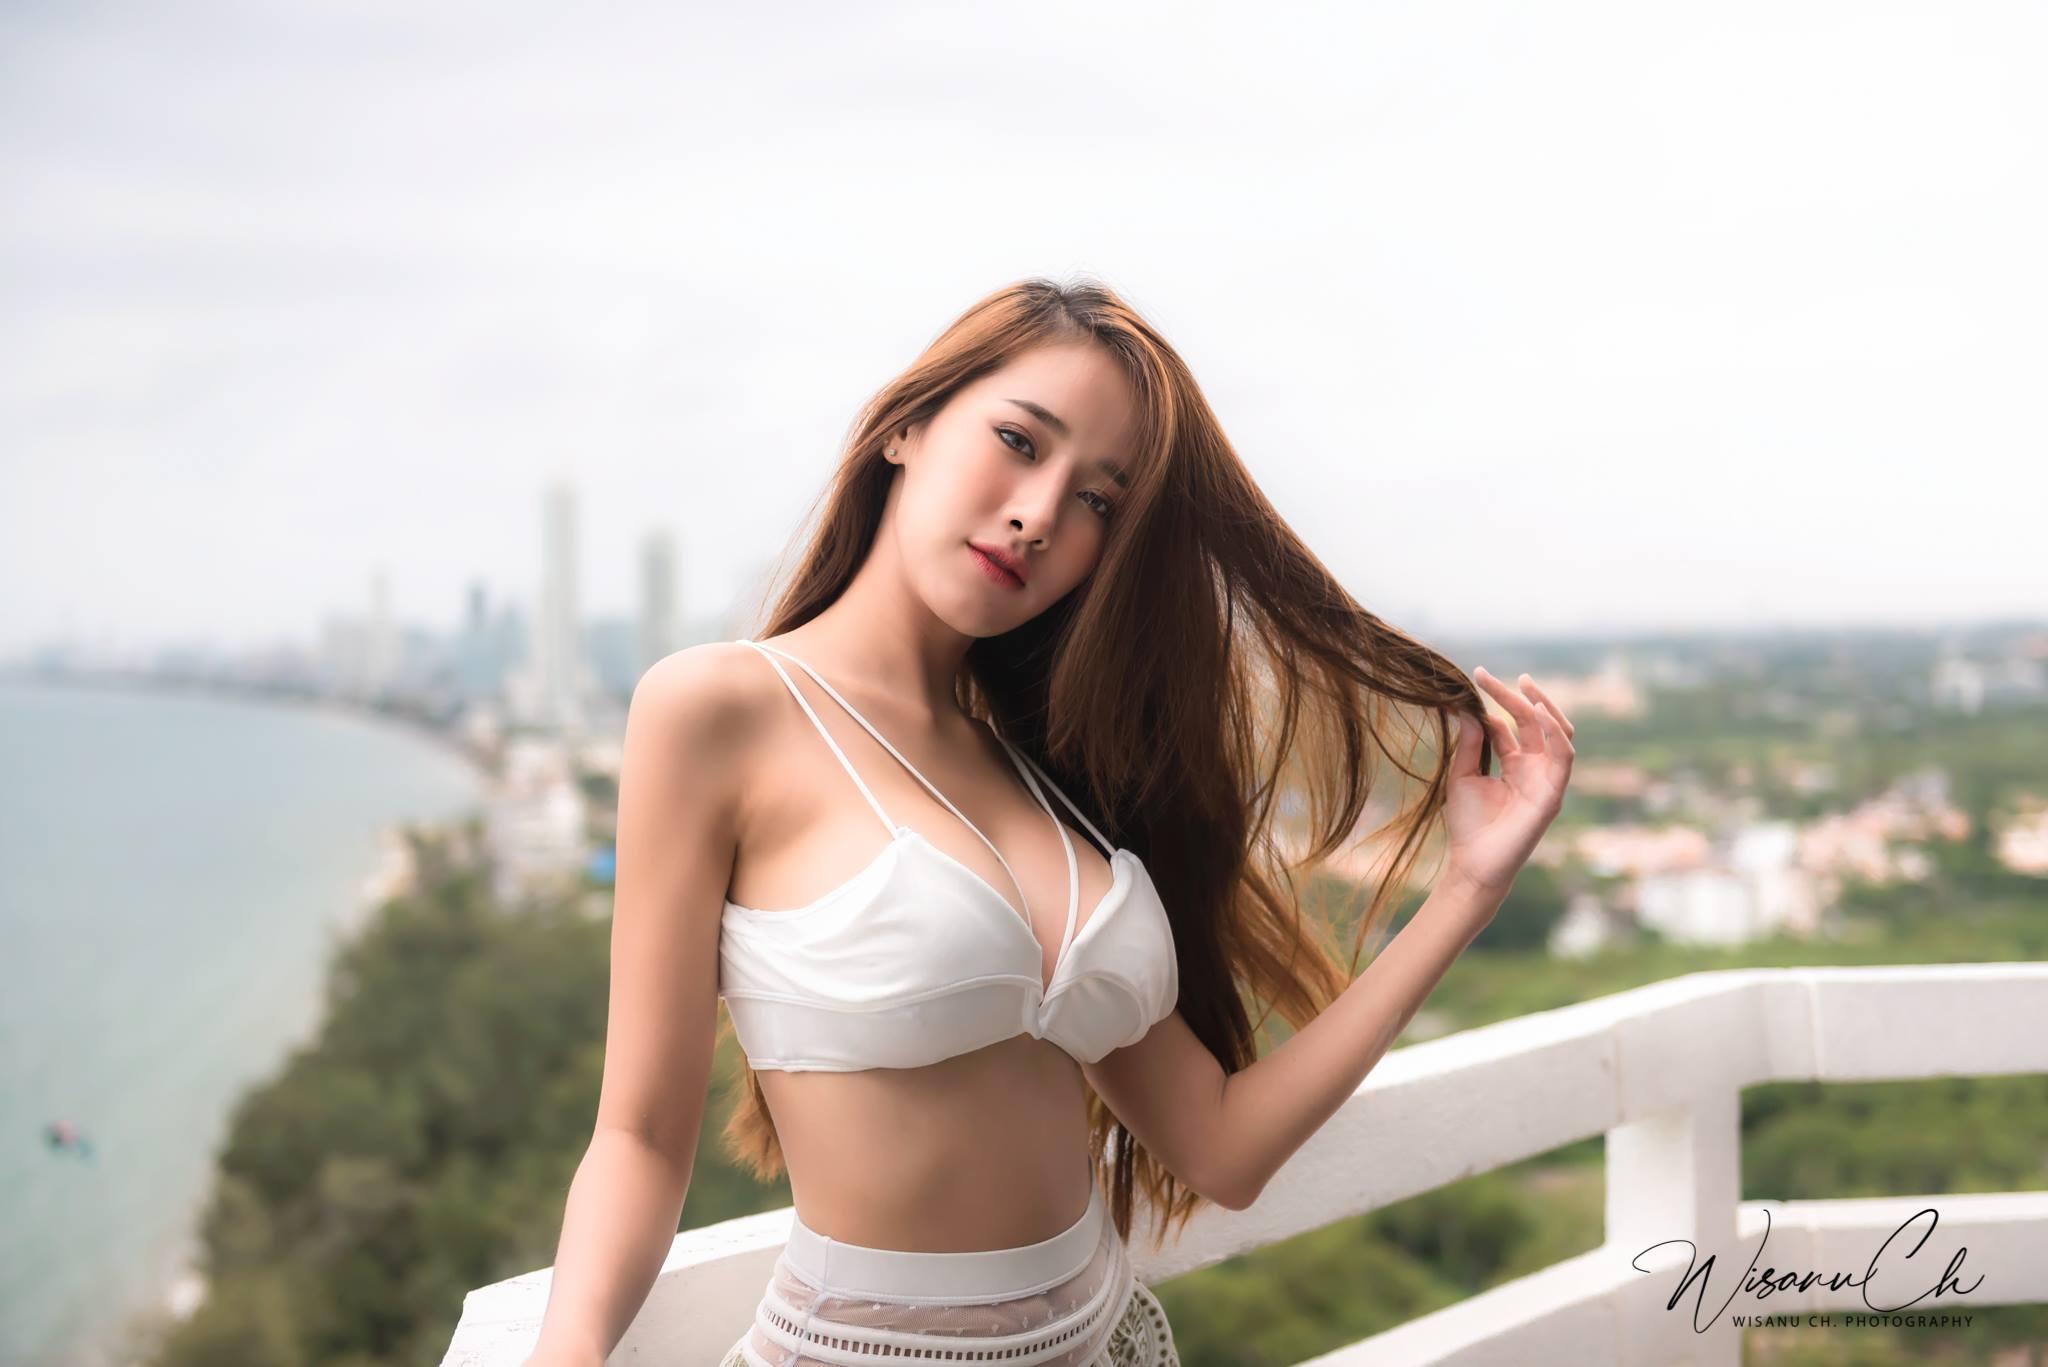 Shower - Pichana Yoosuk